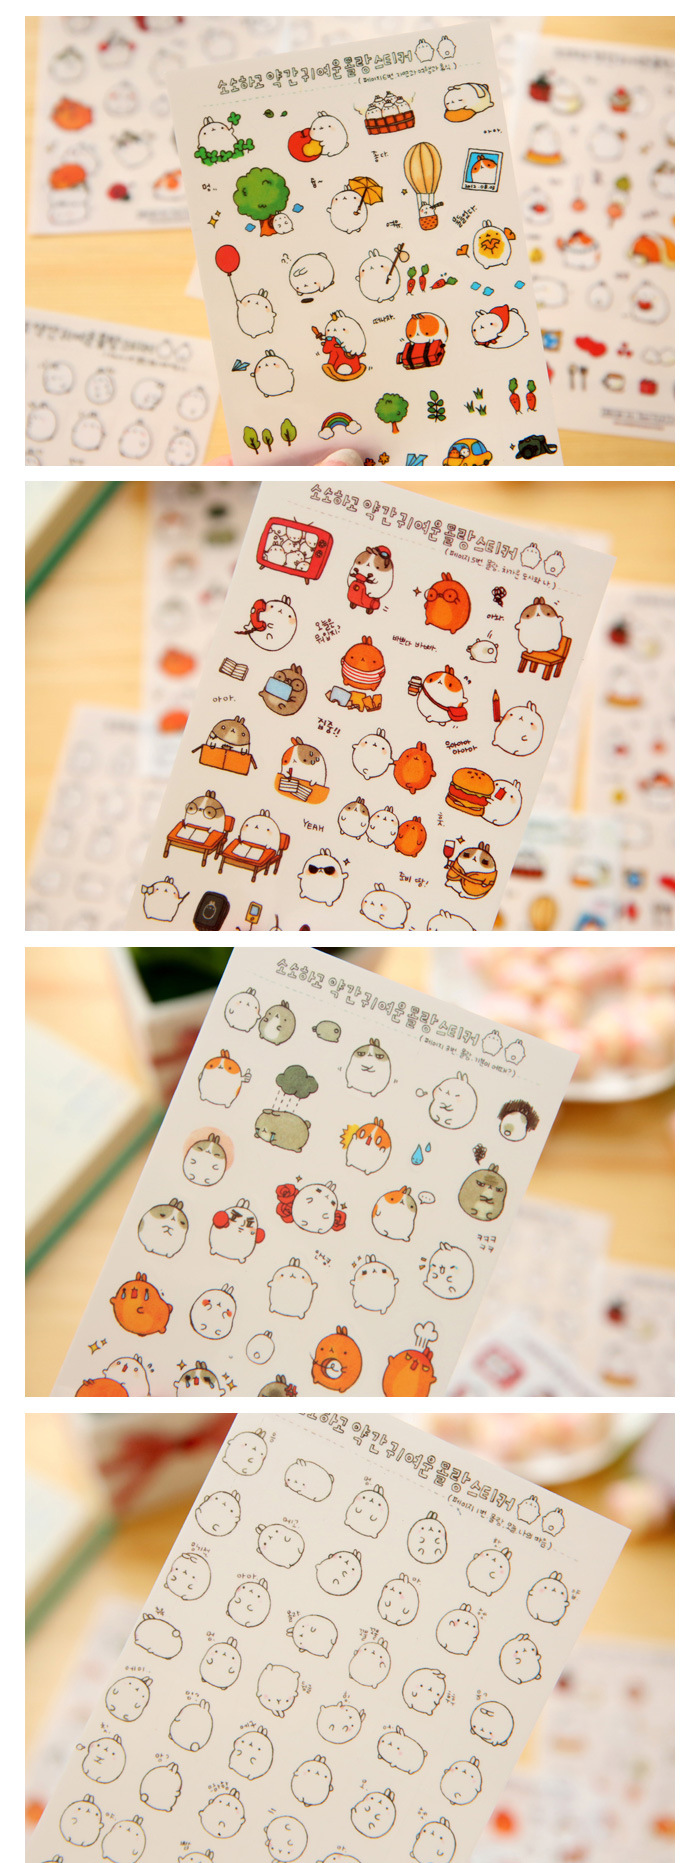 6 Sheetsset Waterproof Diy Notebook Diary Transparent Stickers Cute